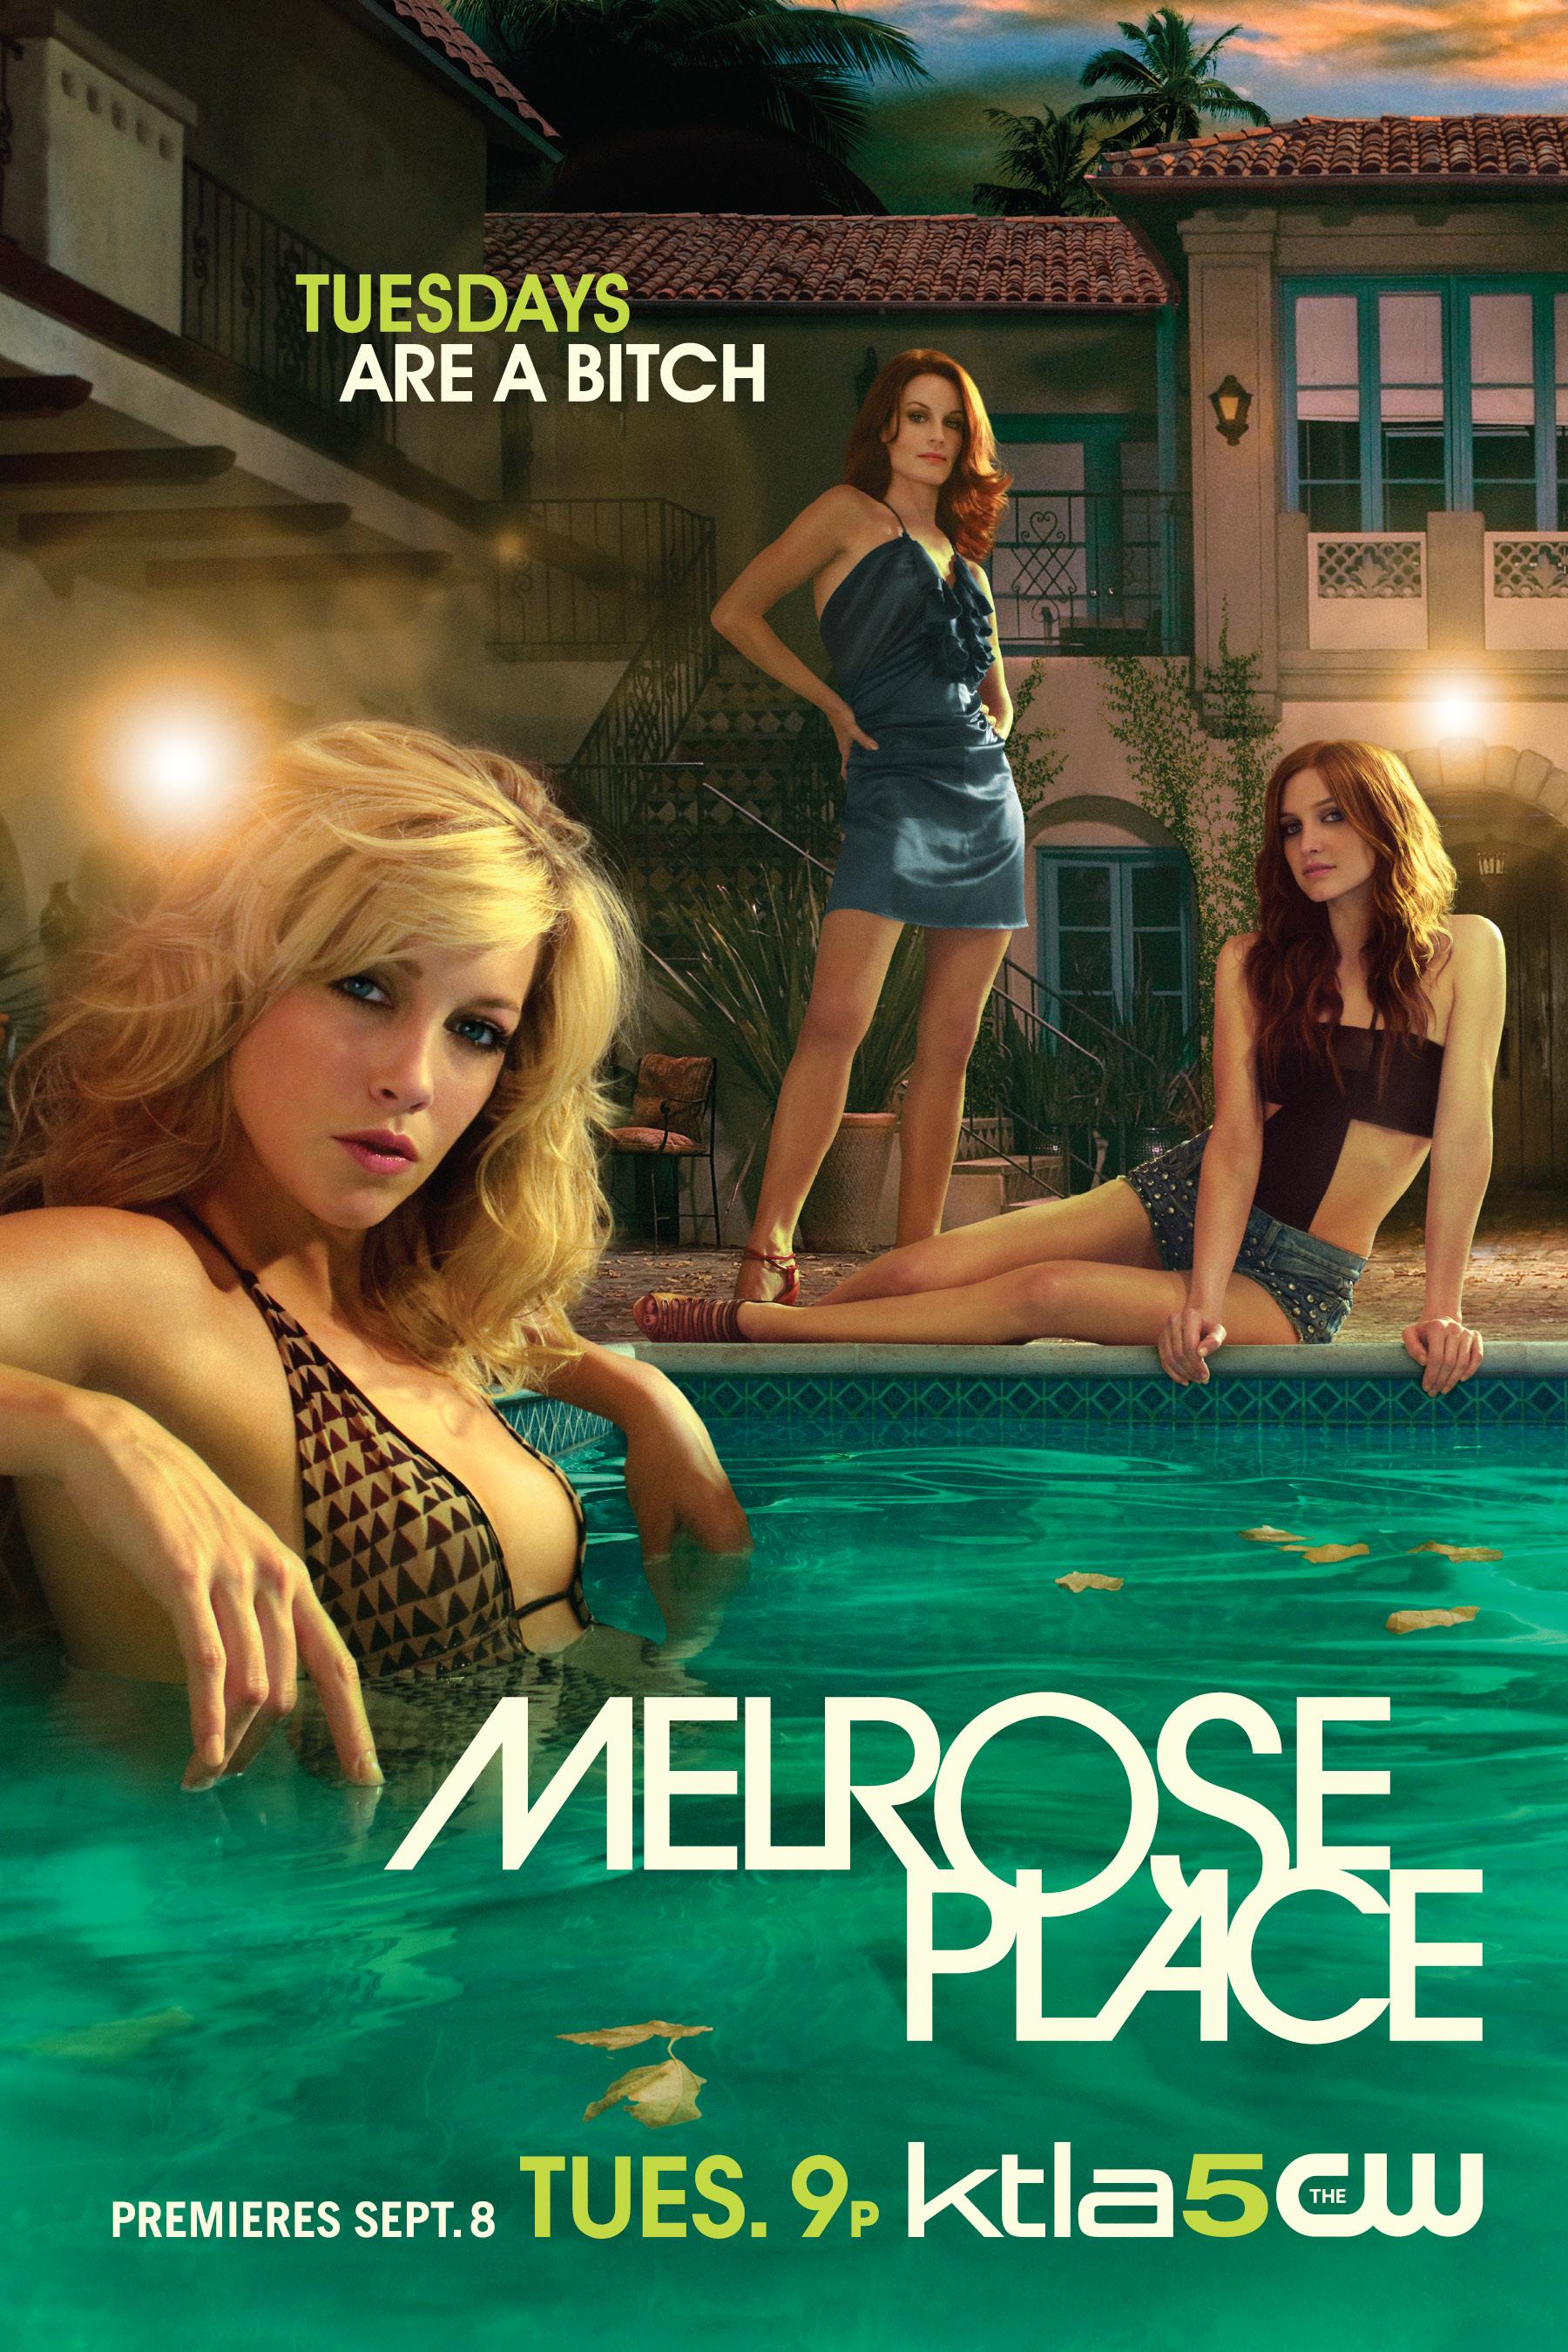 Melrose Place Cast Season 1 Melrose Place 2.0 Season 1